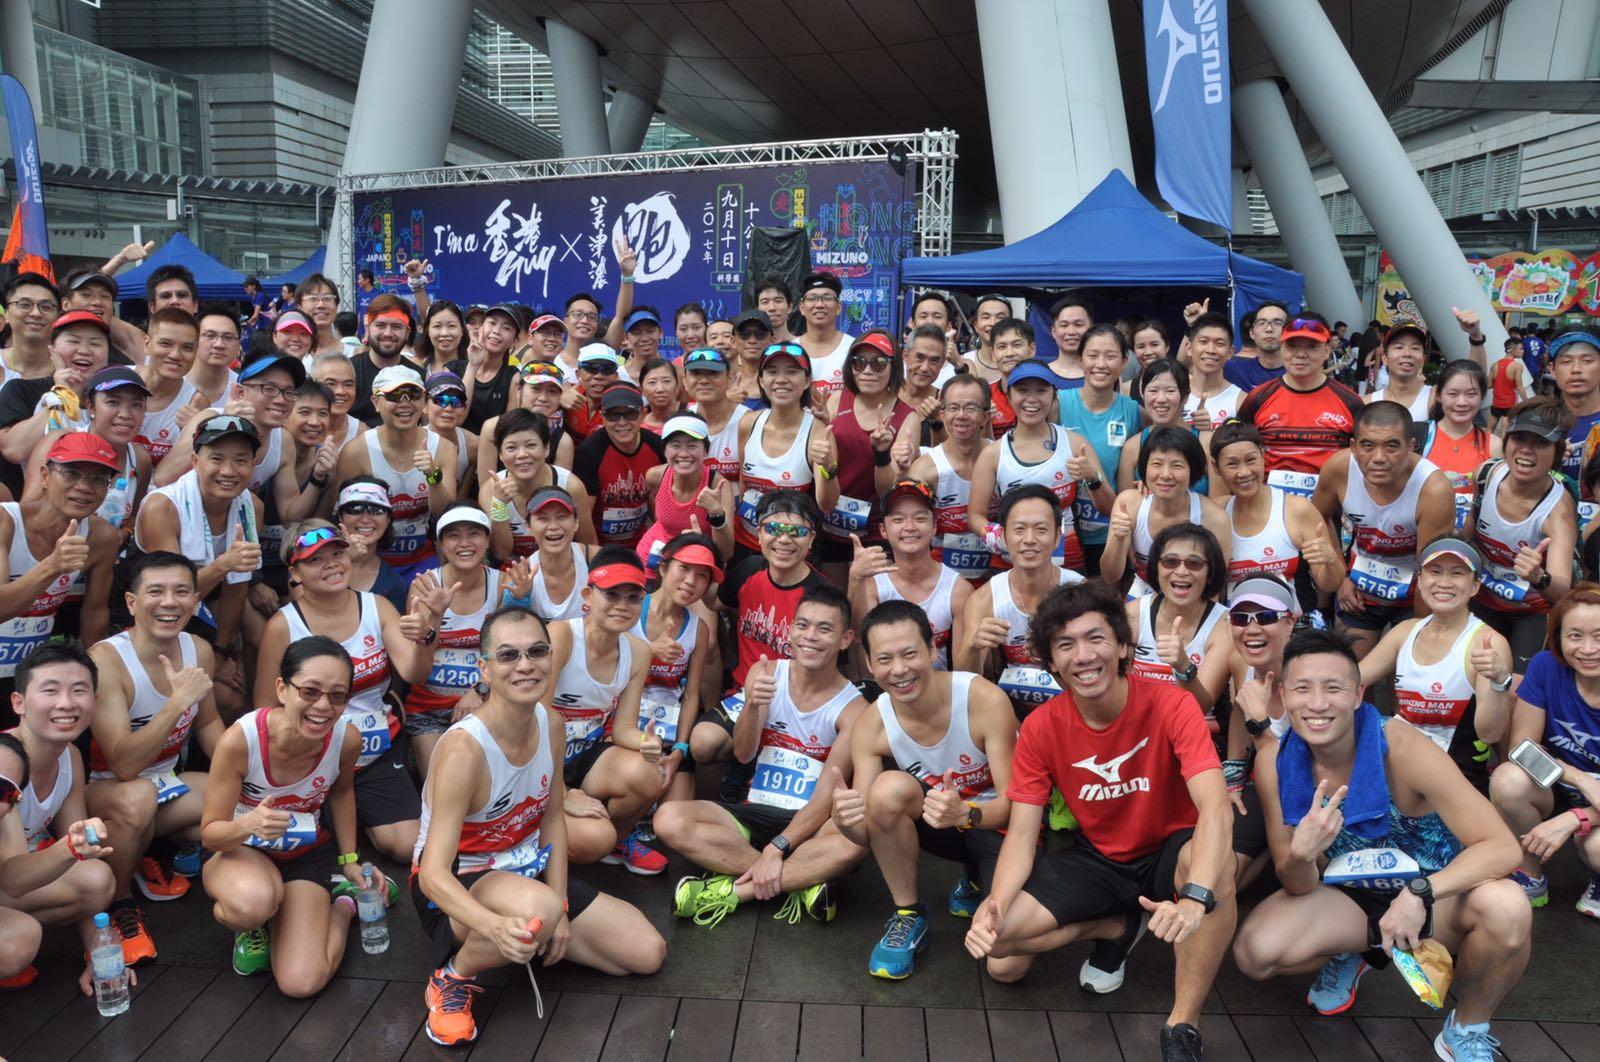 HK Guys X Mizuno Run - 9月10日是HK Guys X Mizuno Run,亦算是本年度長跑賽事的序幕,當日超過100位同學參與了10km或5km賽事。而文少杰教練當日亦到場為同學拍照,所有相可以在我們的相薄瀏覽及下載:https://www.flickr.com/photos/runningmanac/albums/72157685038925792